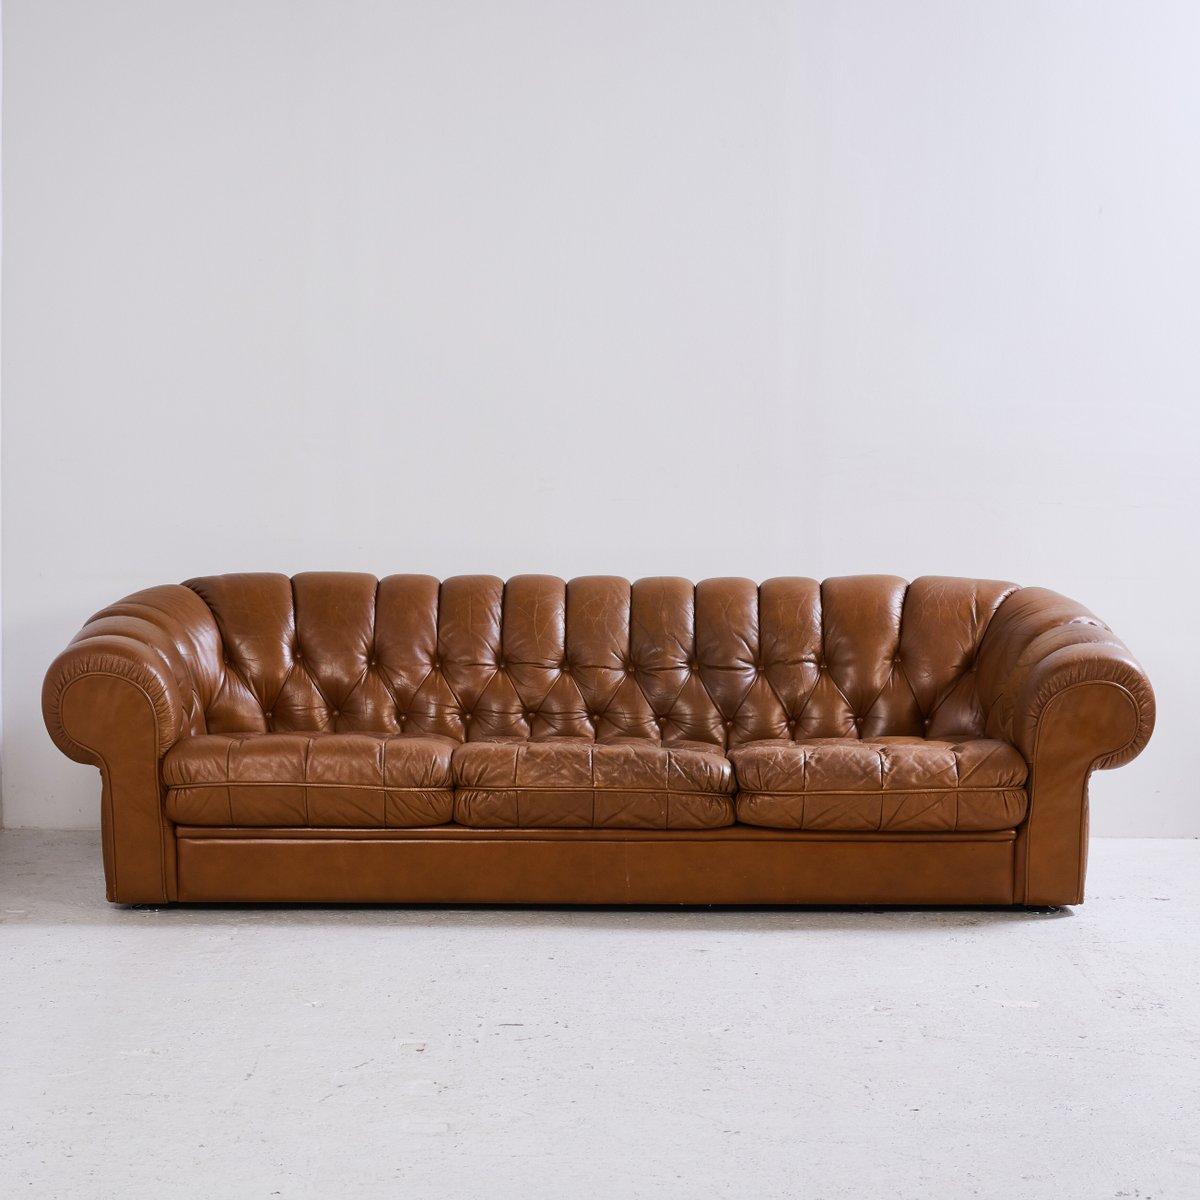 Chesterfield Sofa Set aus Leder, 1970er bei Pamono kaufen